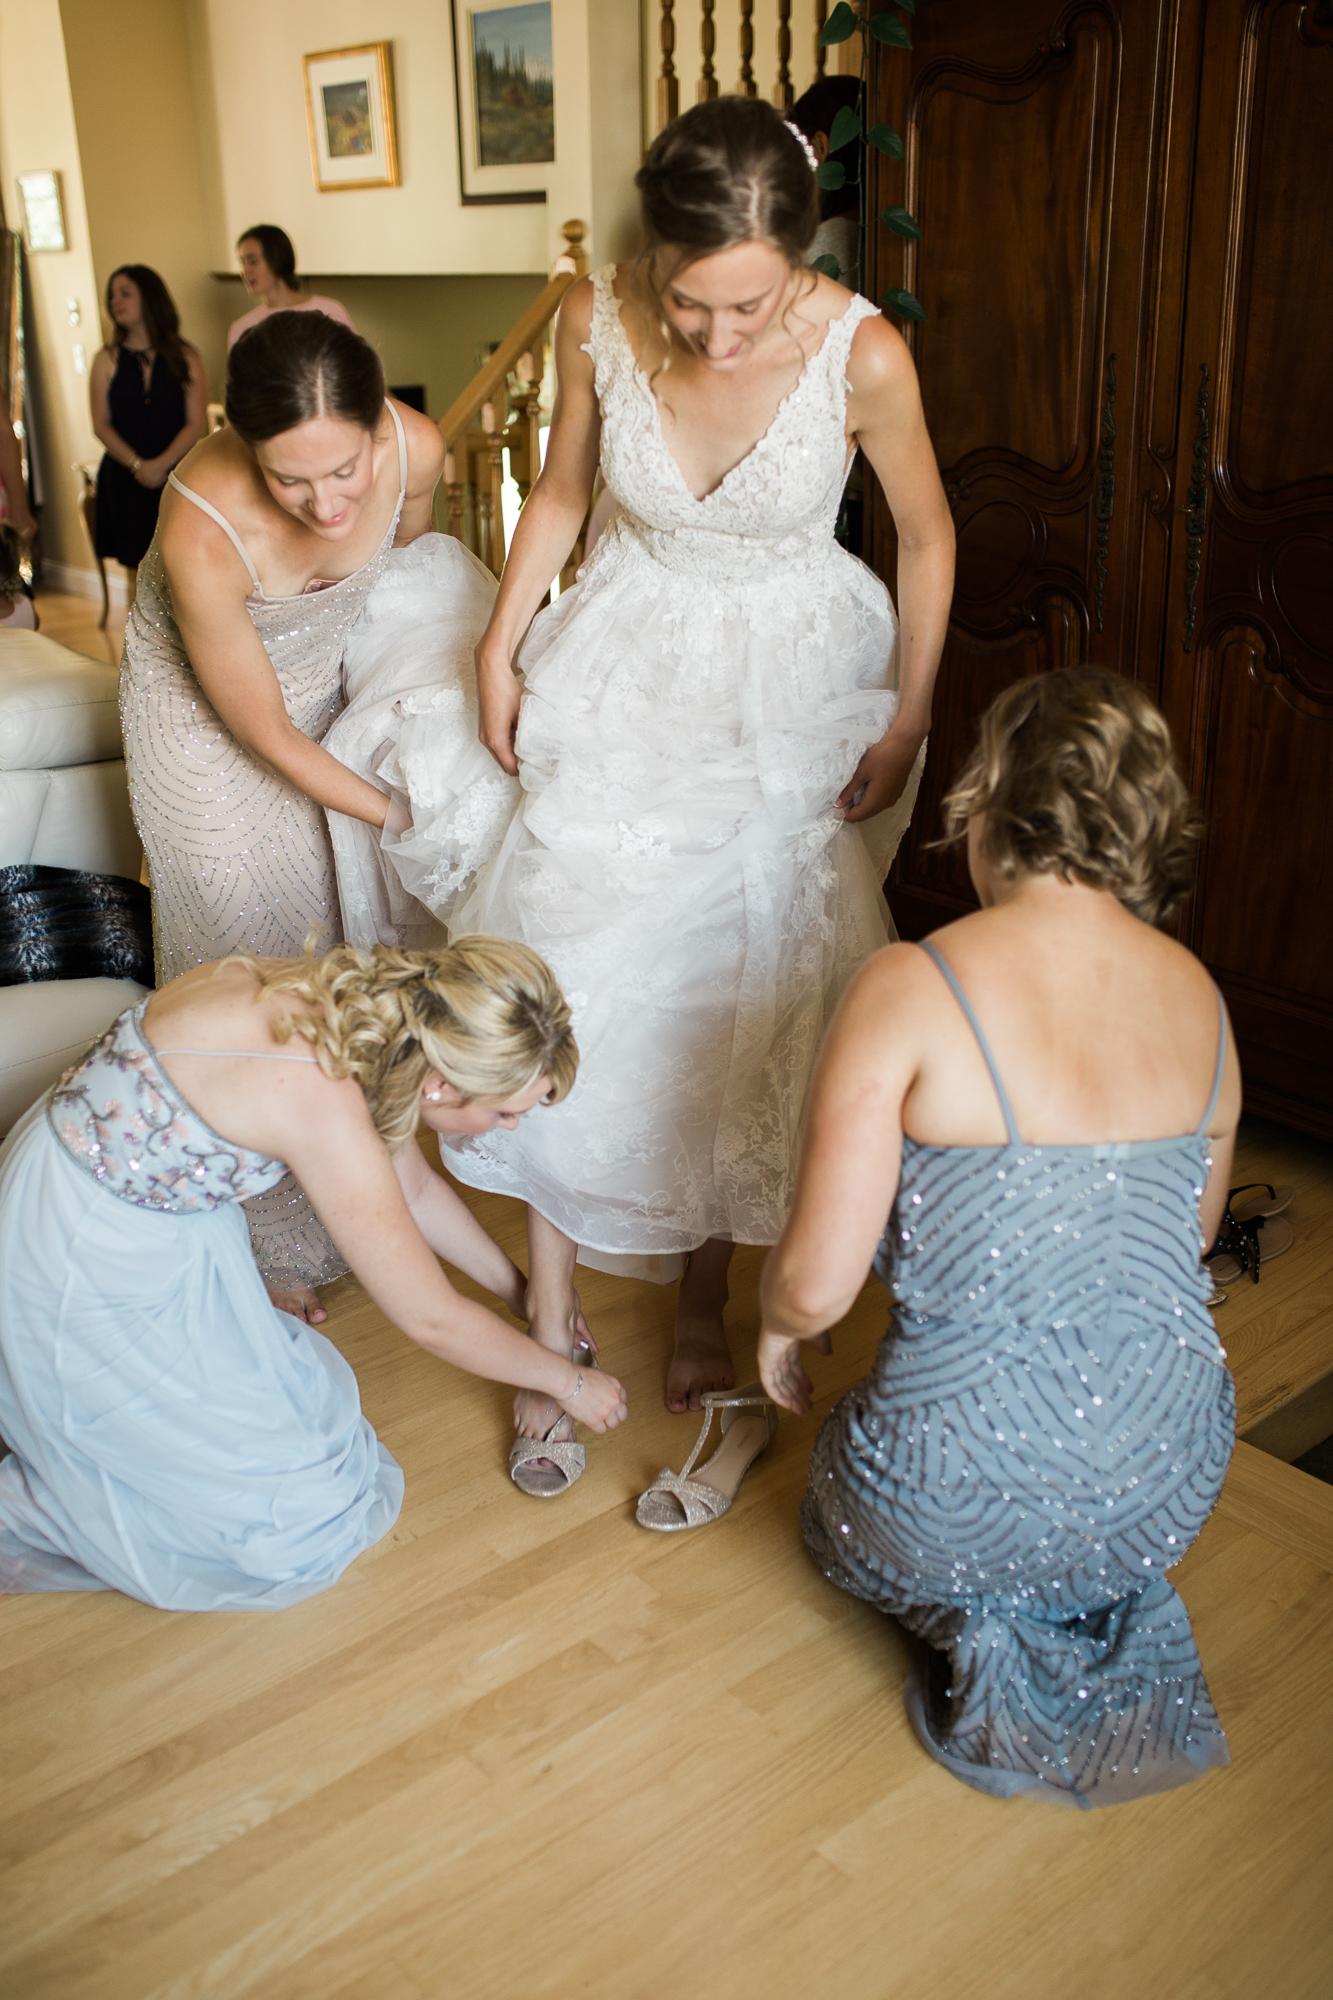 Calgary-wedding-photographer-NN-15.jpg